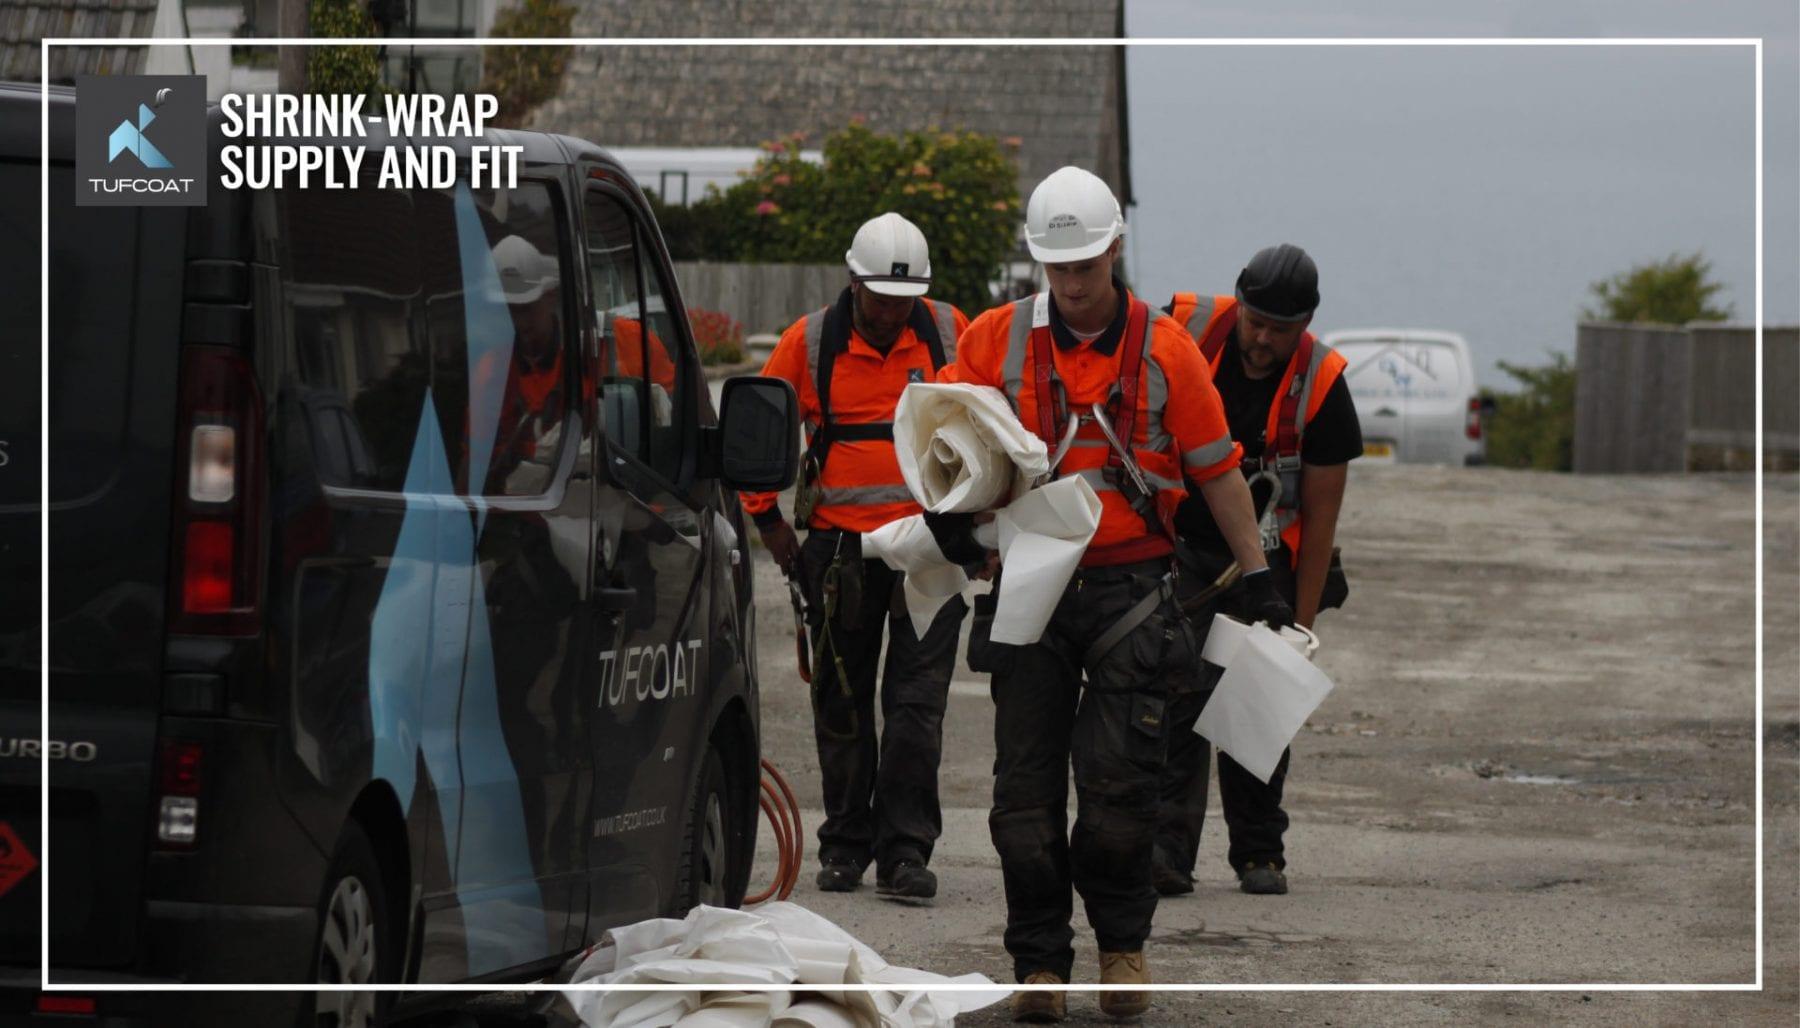 Tufcoat-Shrink-wrap-scaffold-shrink-wrap-training-and-supply2